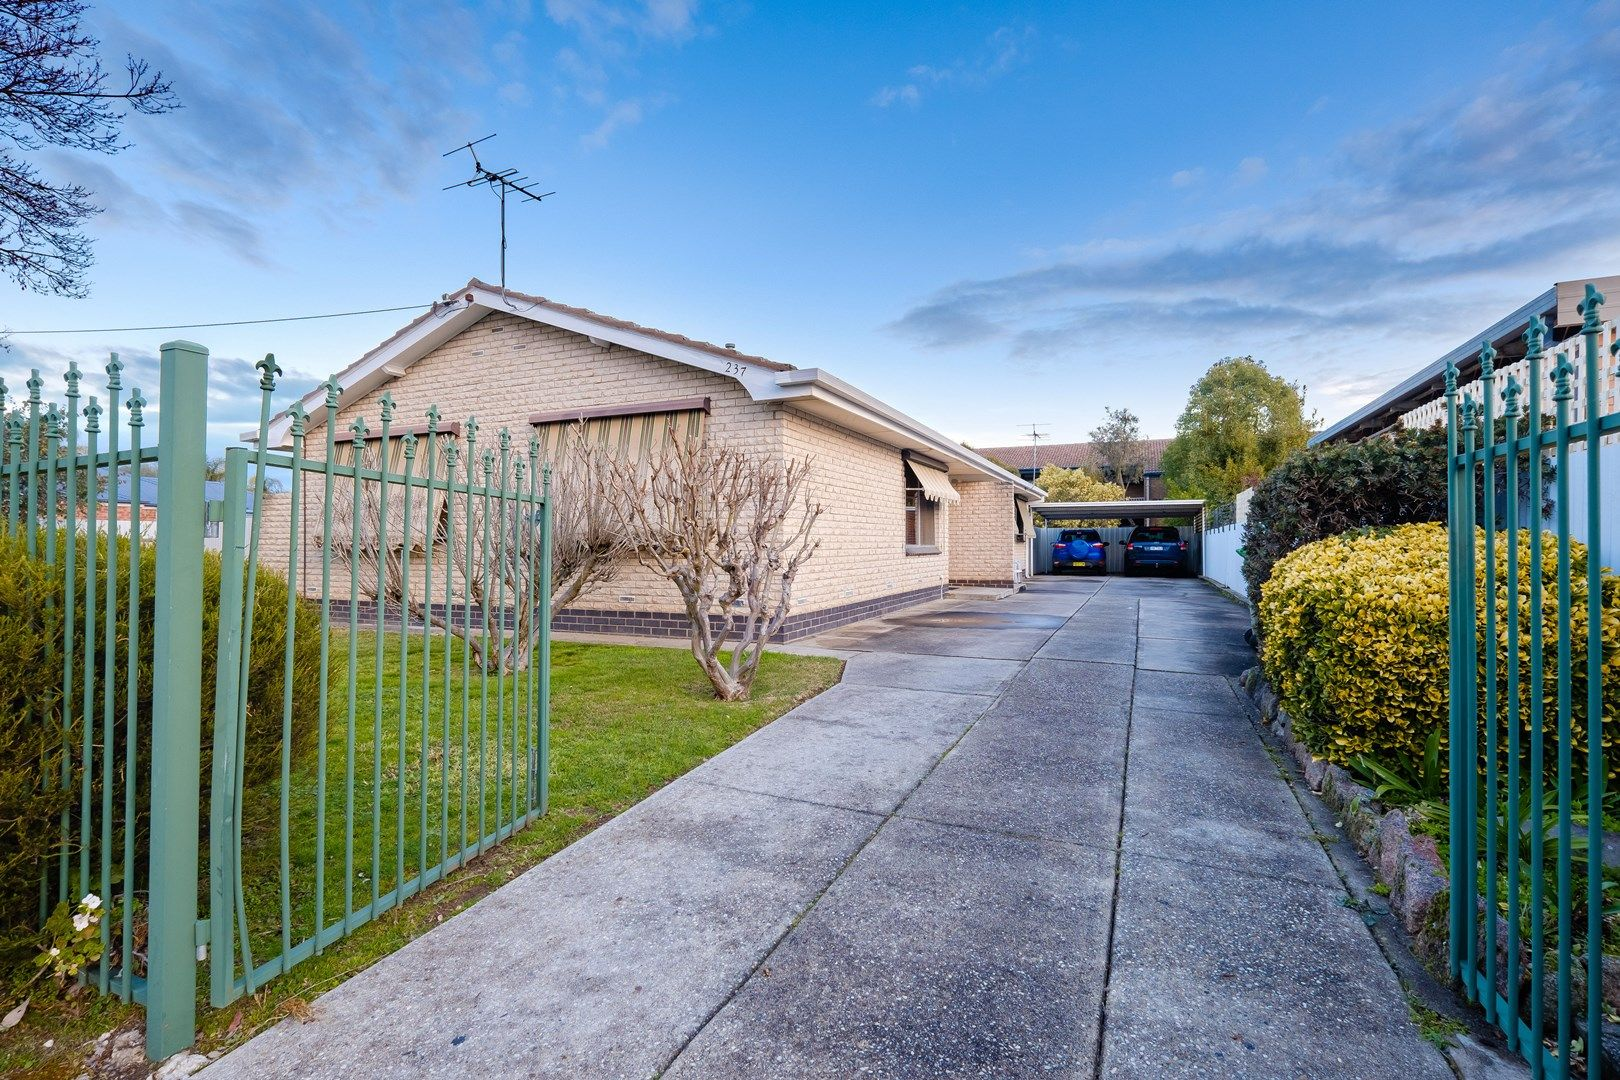 1/237 Gulpha Street, North Albury NSW 2640, Image 0